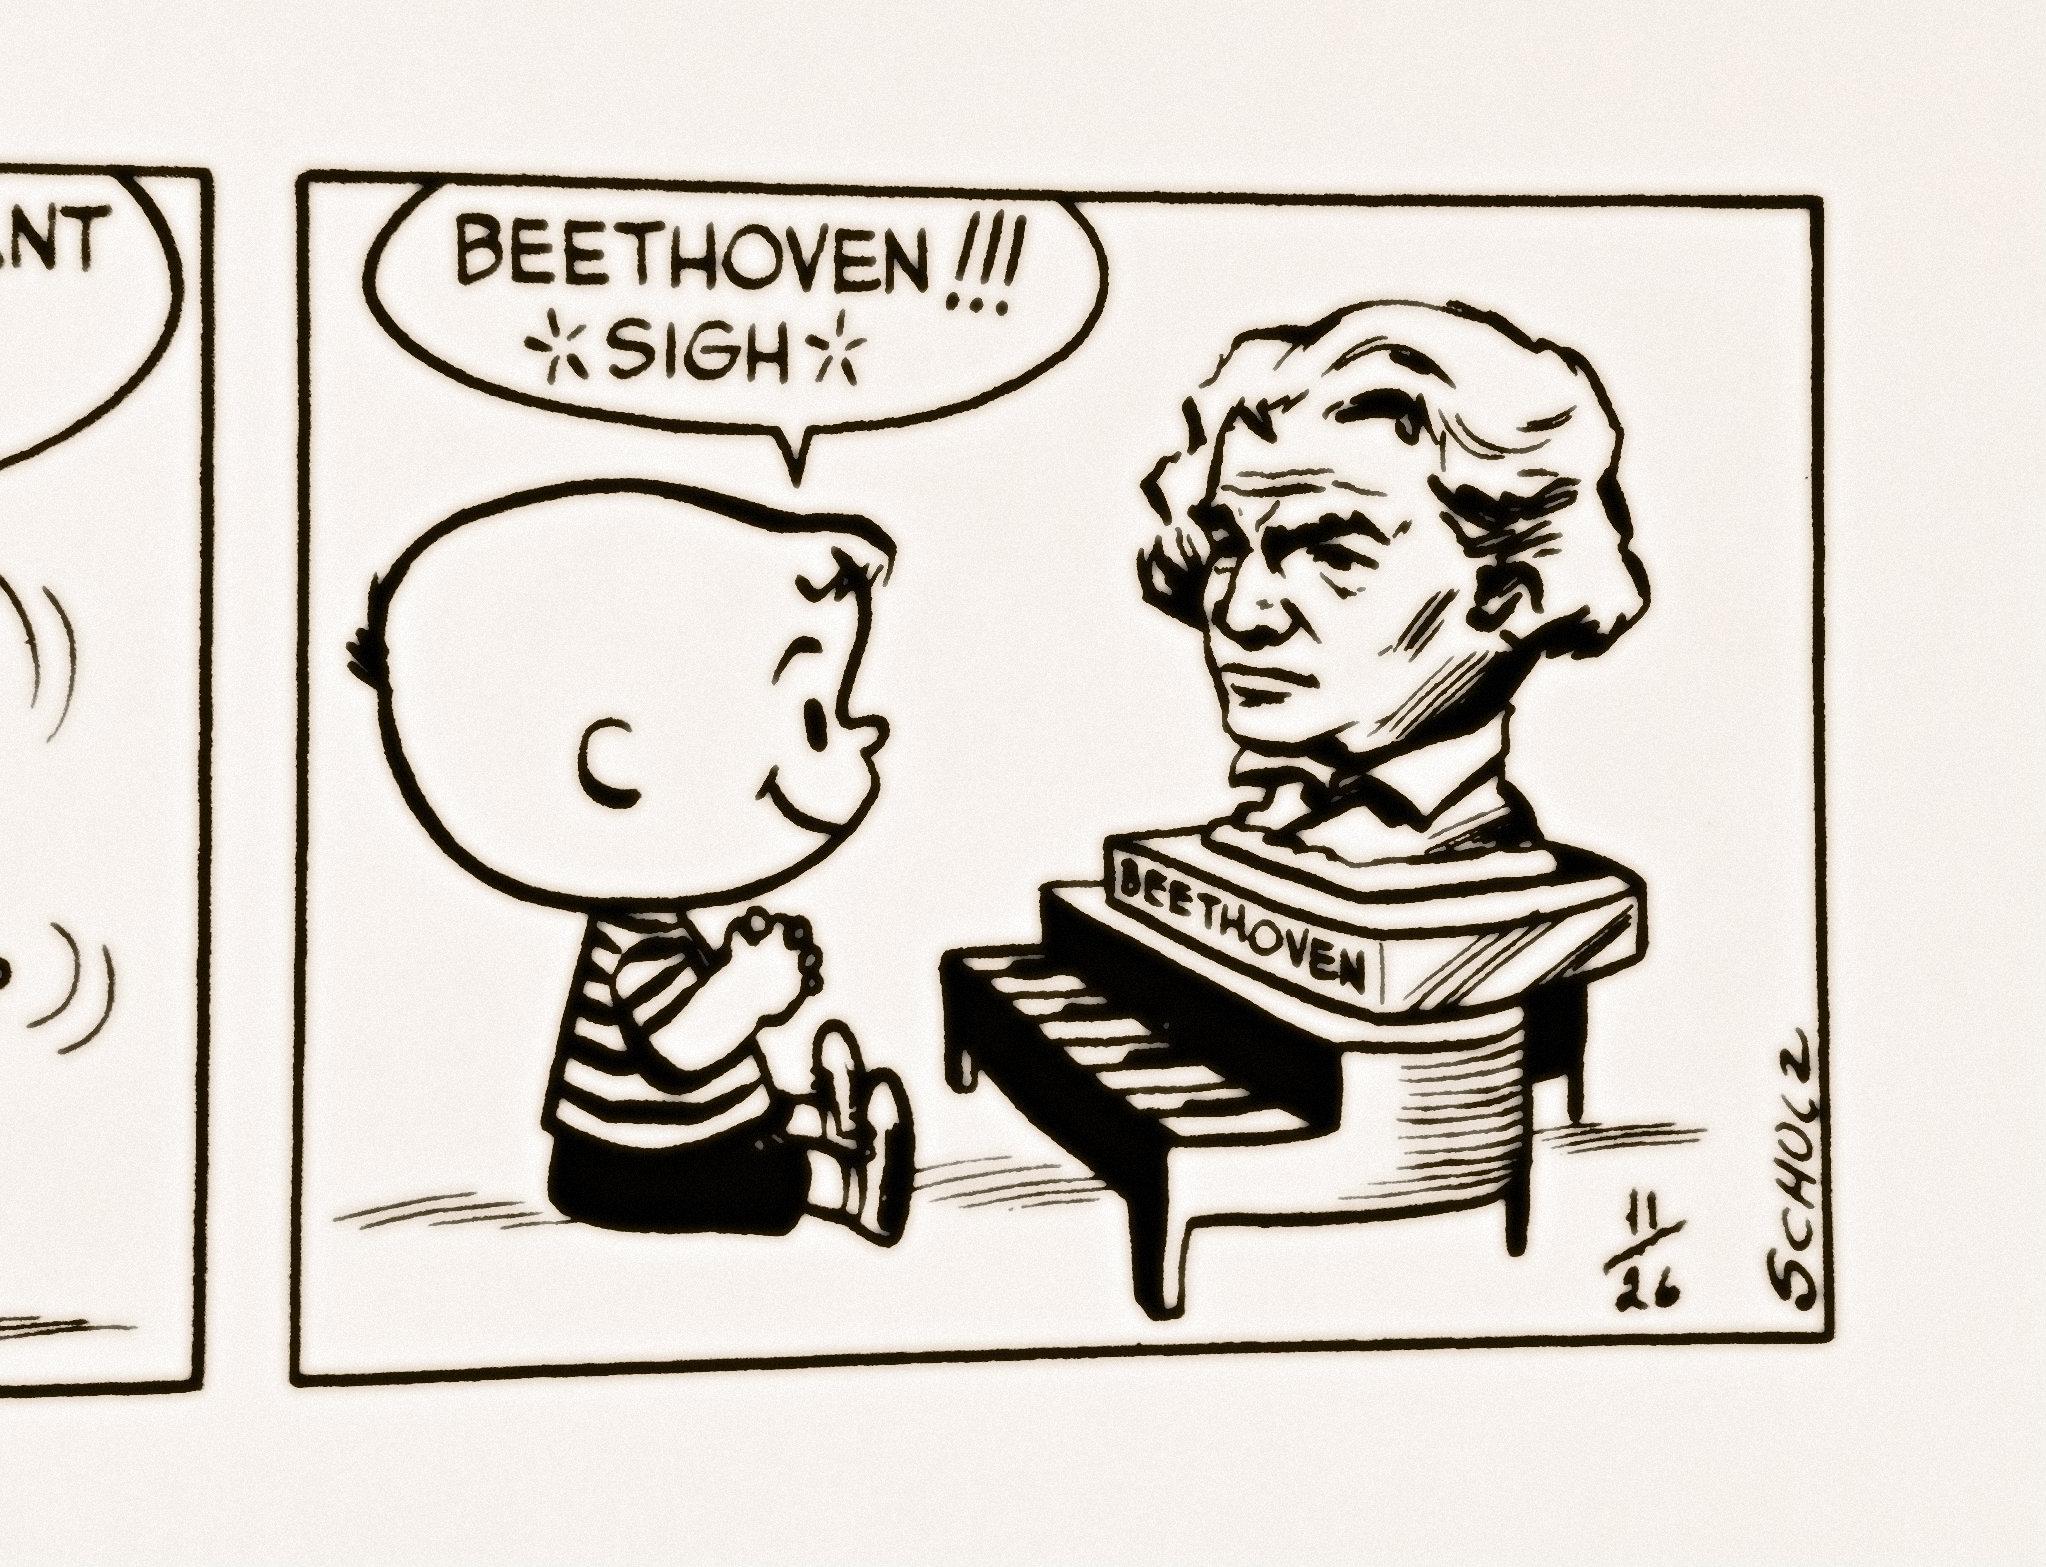 Photo: Peanuts Beethoven bust